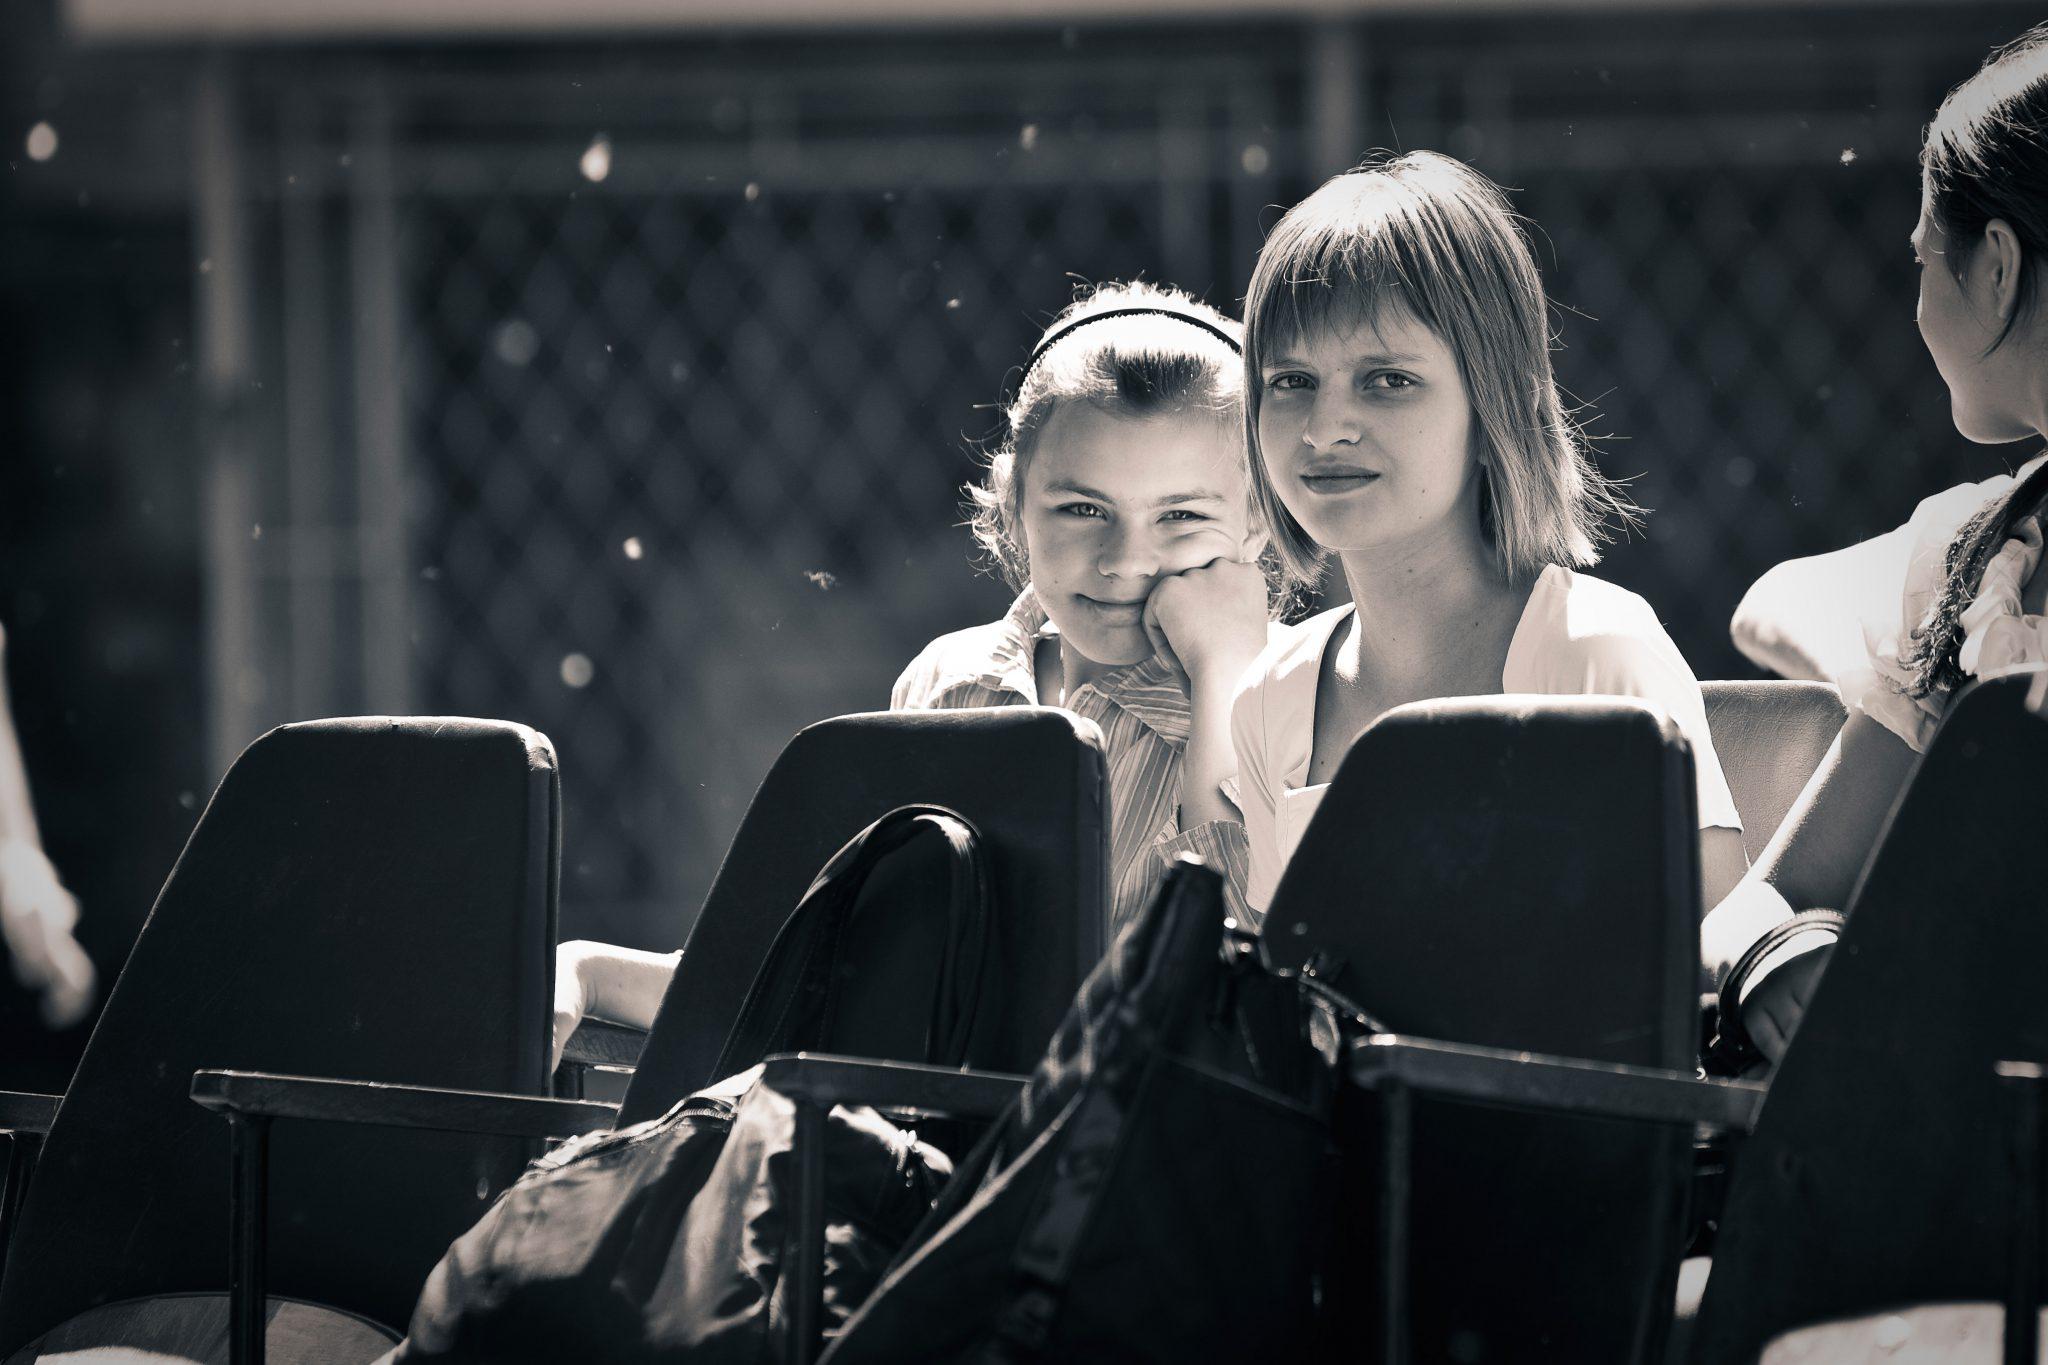 Girls in Chisinau